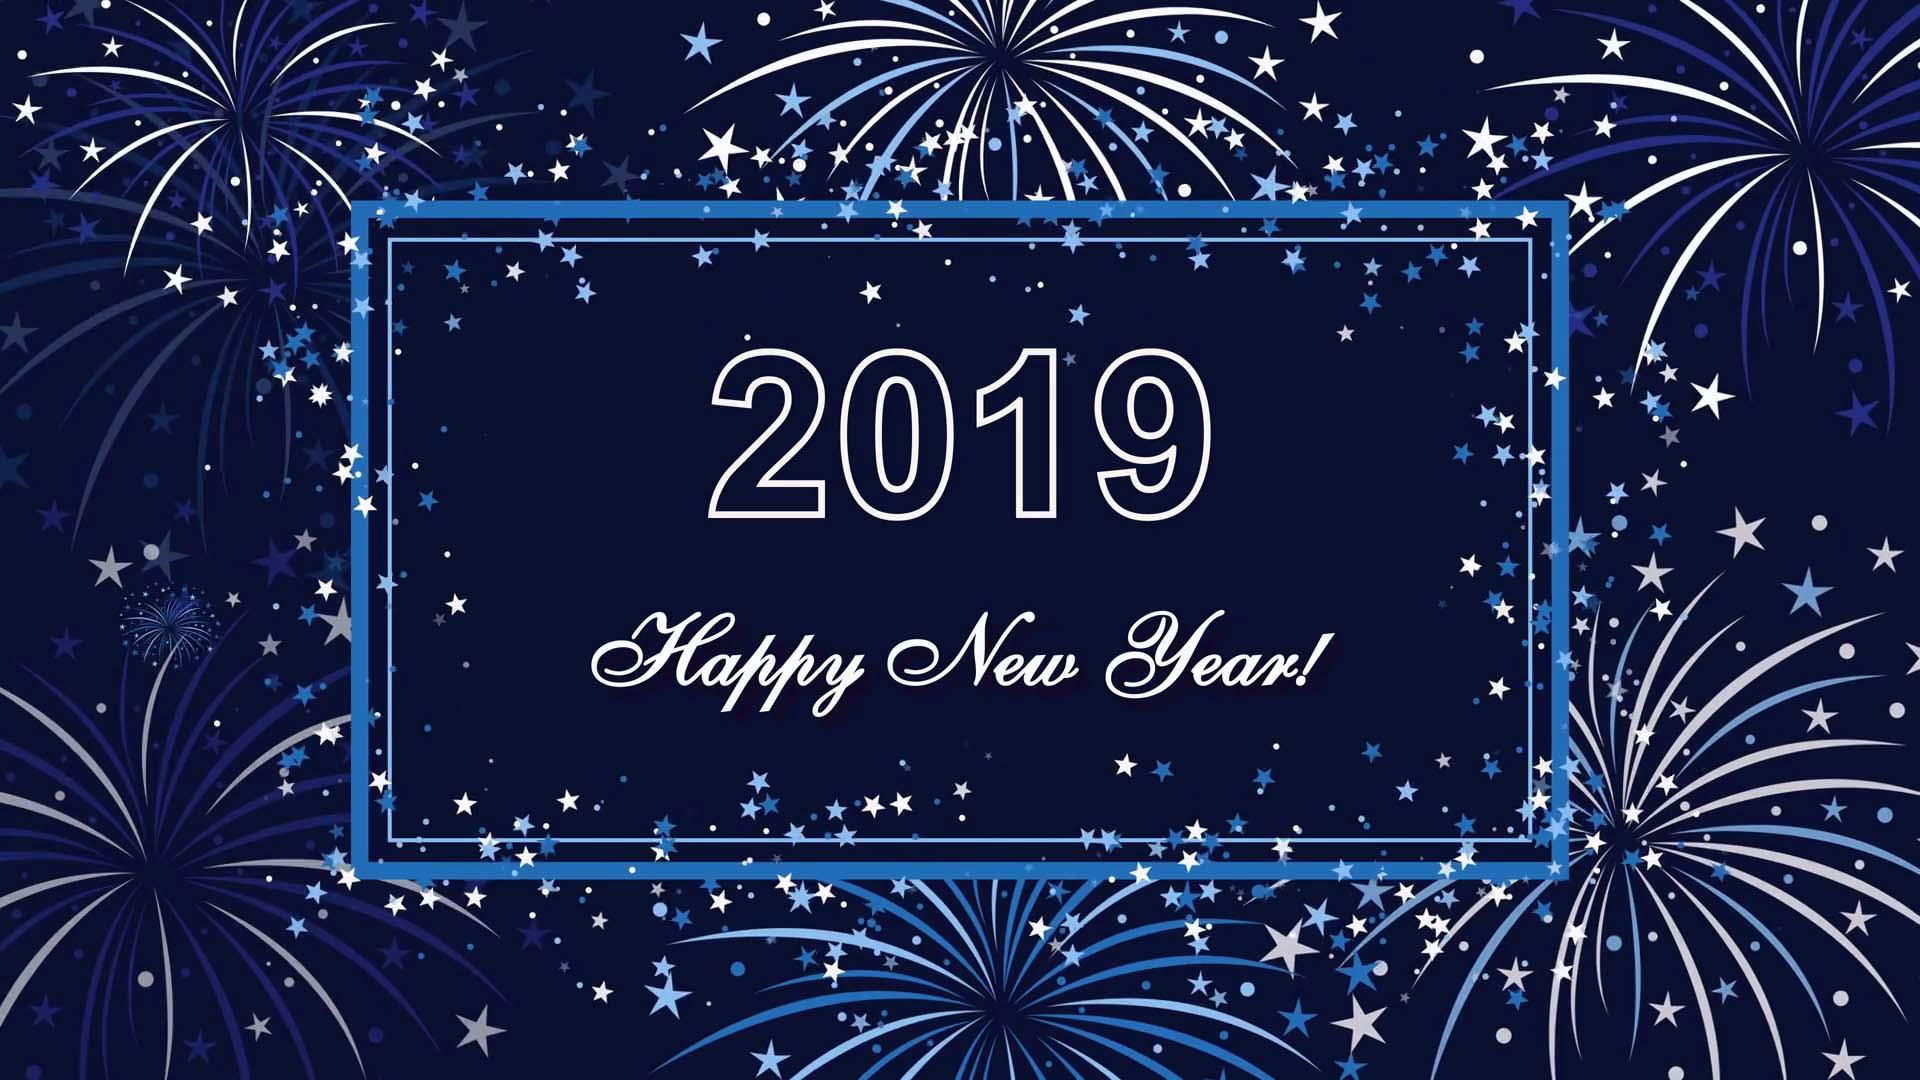 Wallpaper happy new year 2019 pc